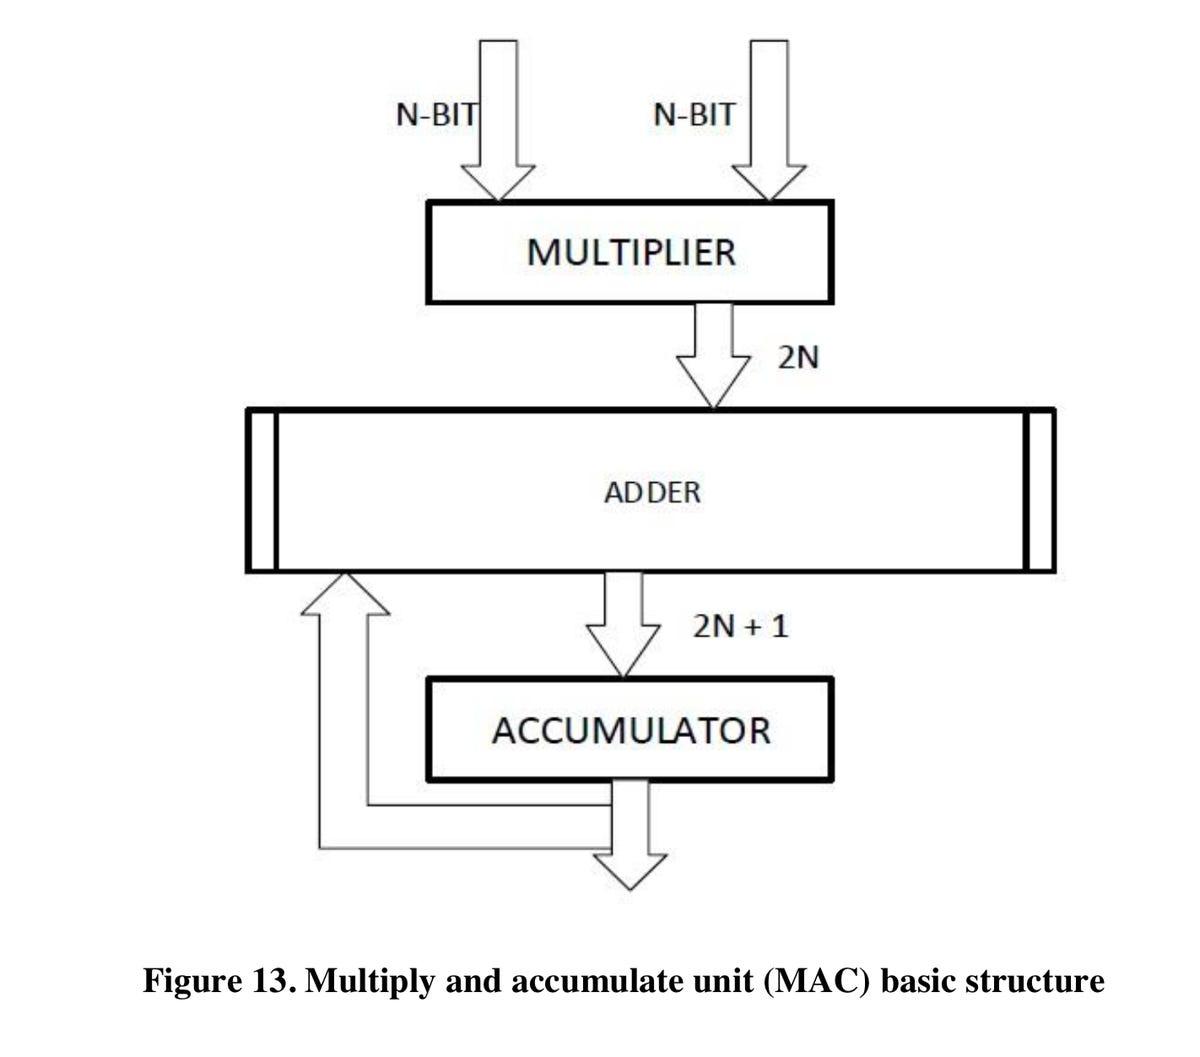 upadhyay-and-chowdhury-2019-mac-circuit-diagram.png